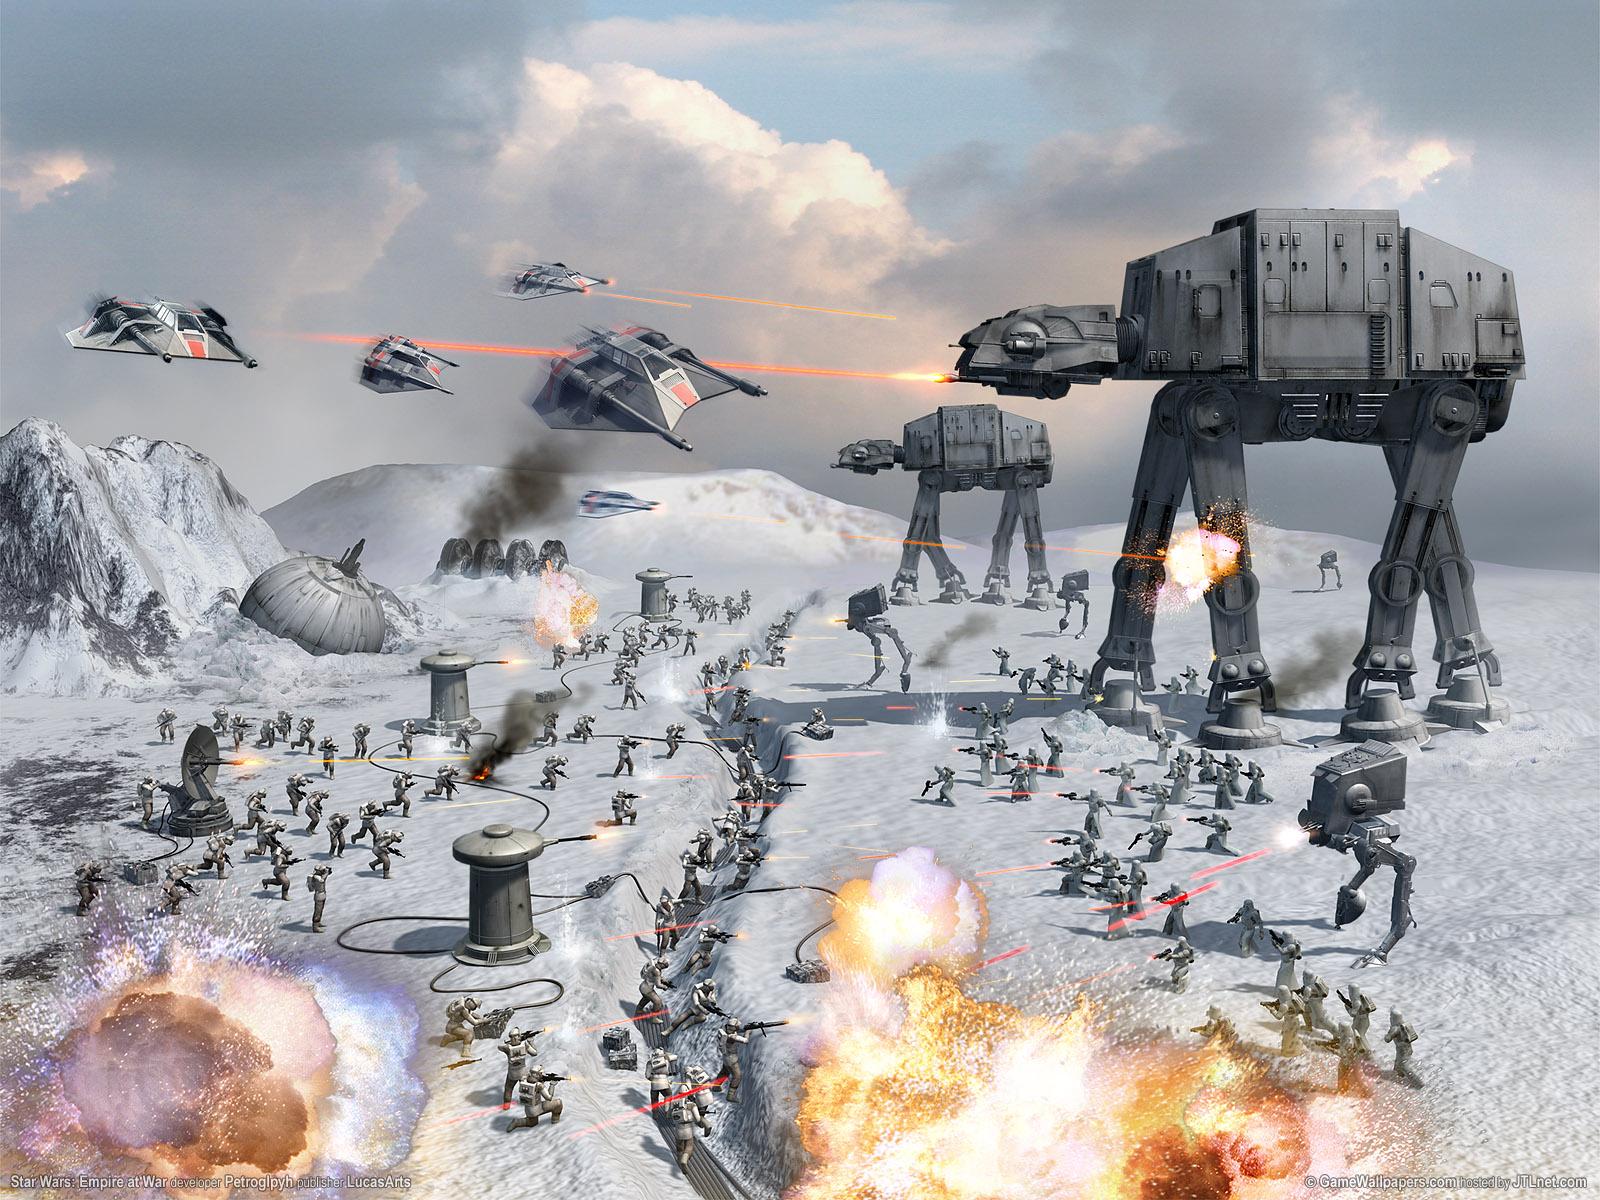 71 Star Wars Home Wallpaper On Wallpapersafari